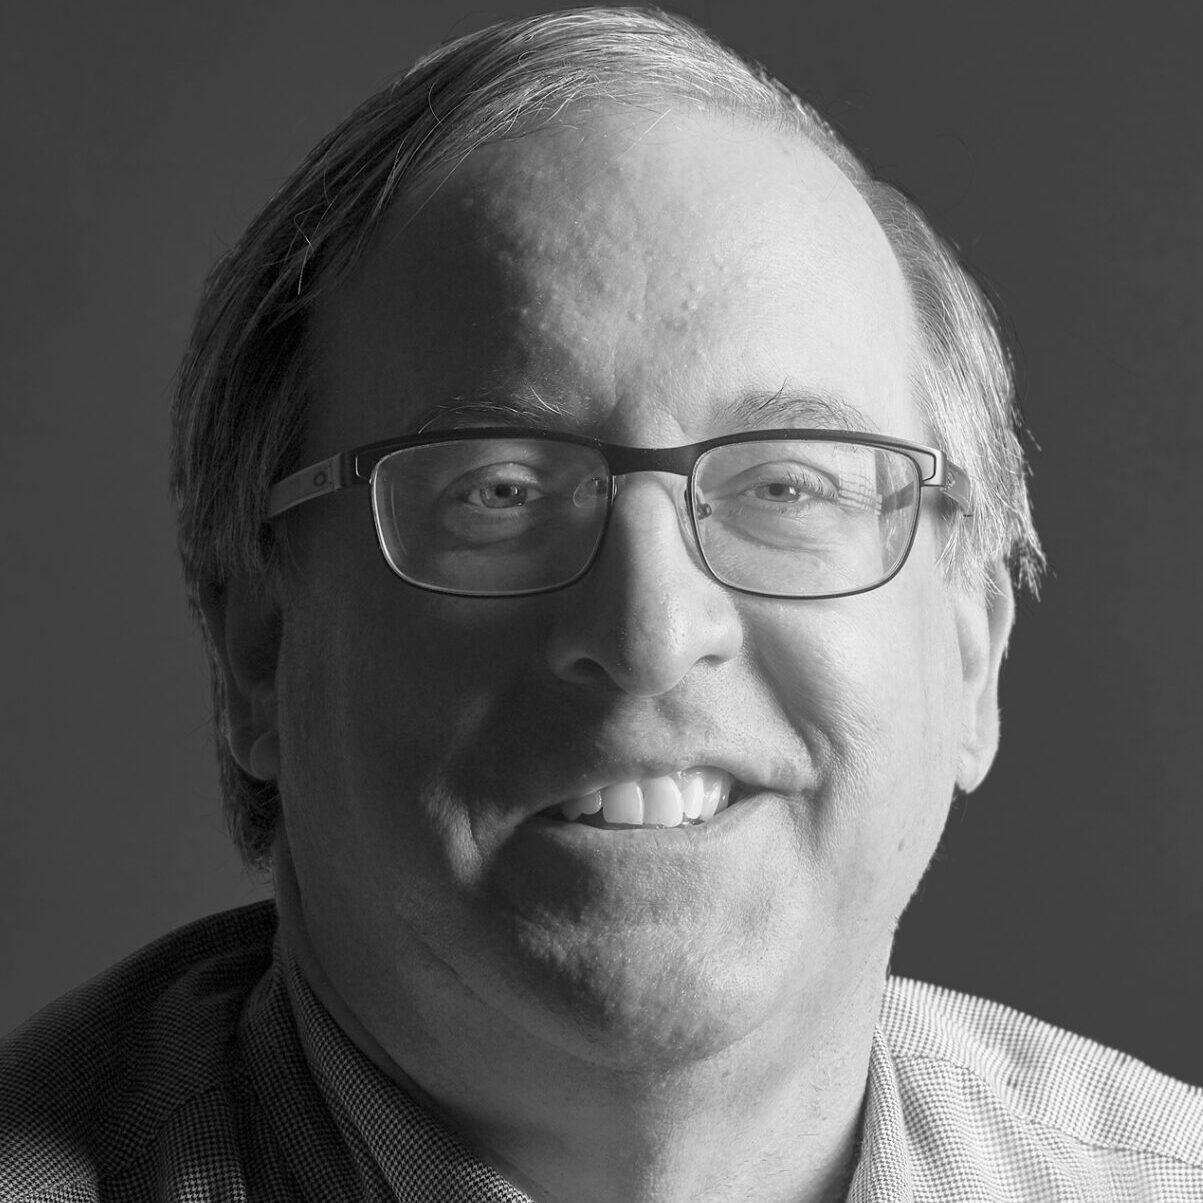 Jeffrey Panarey